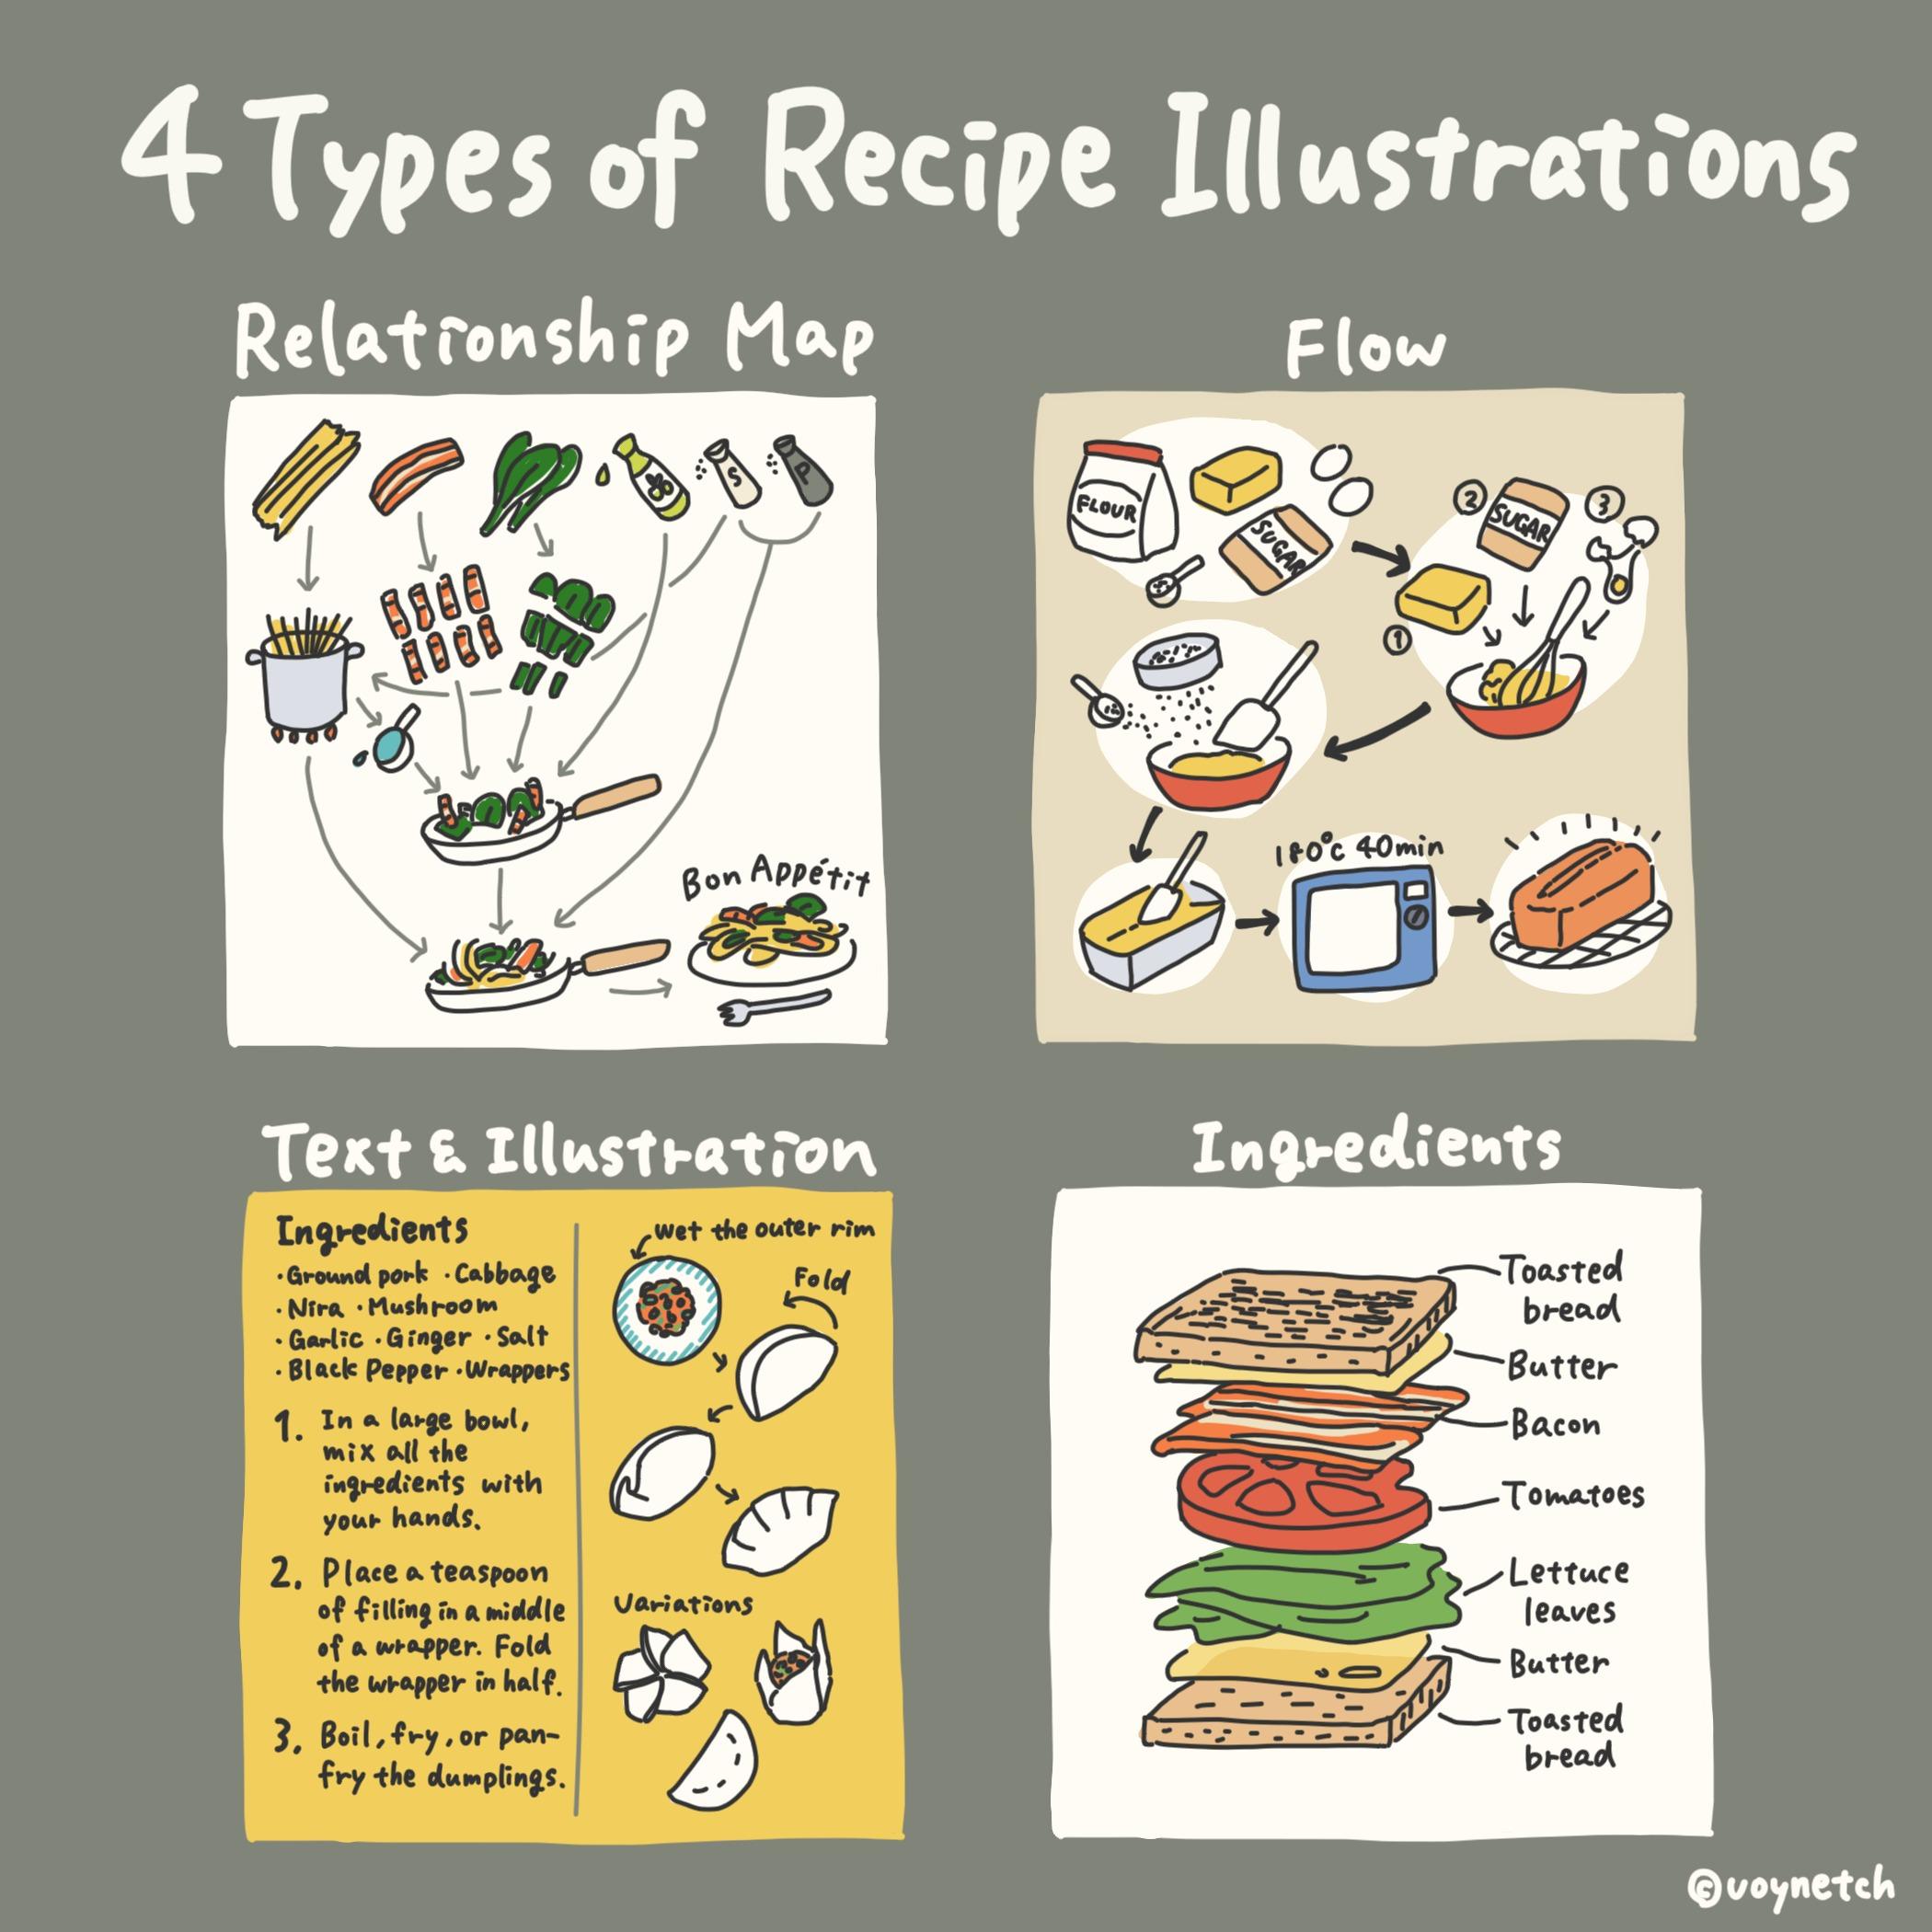 4 Types of Recipe Illustrations Image